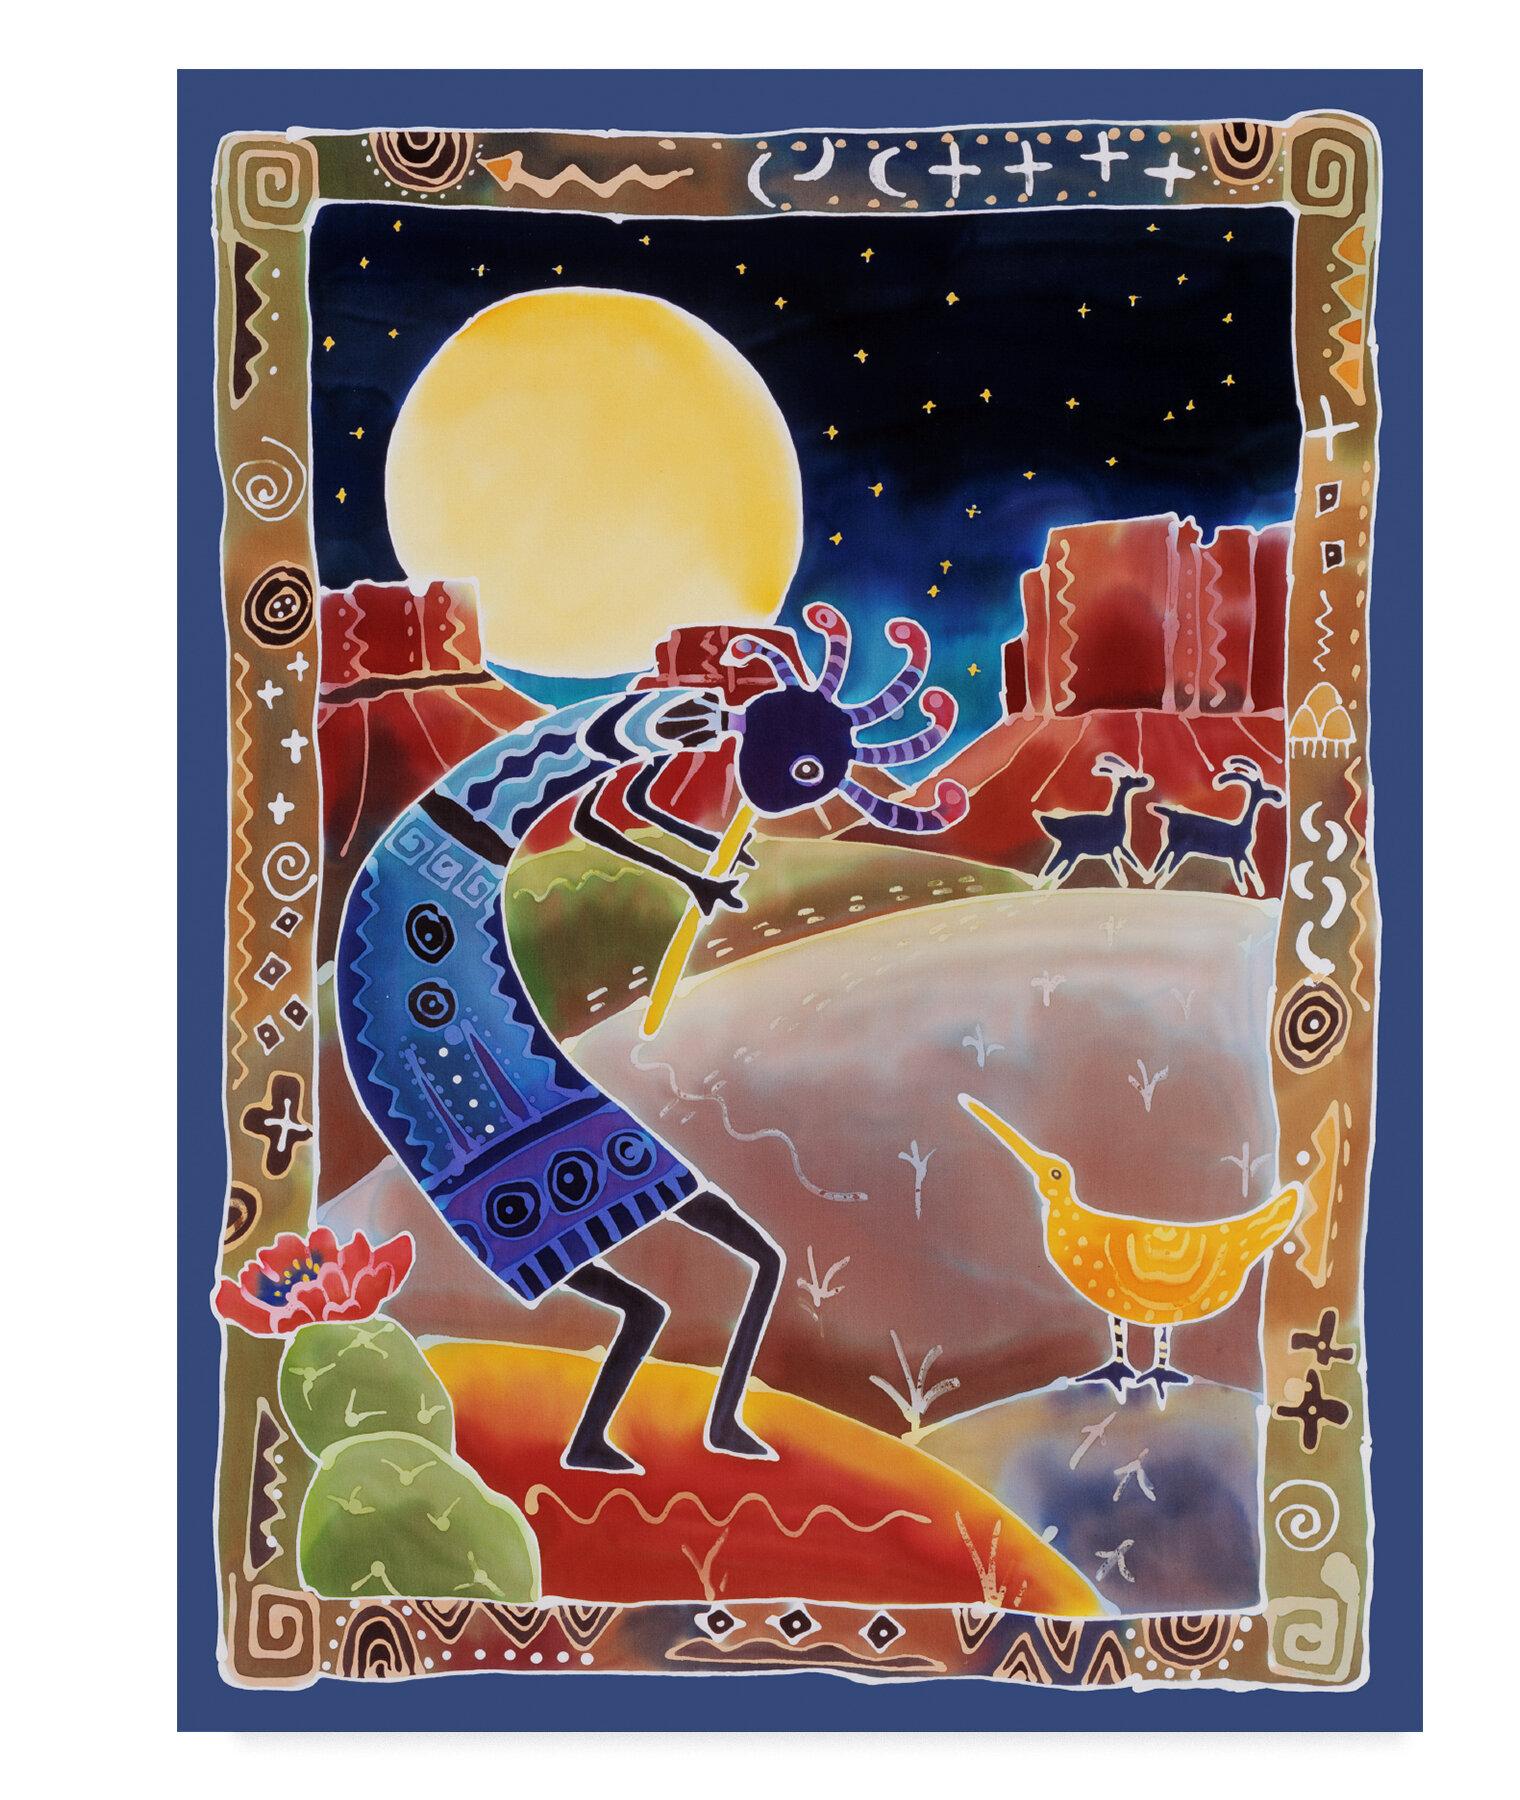 Trademark Art Kokopelli Sings Up The Moon Acrylic Painting Print On Wrapped Canvas Reviews Wayfair